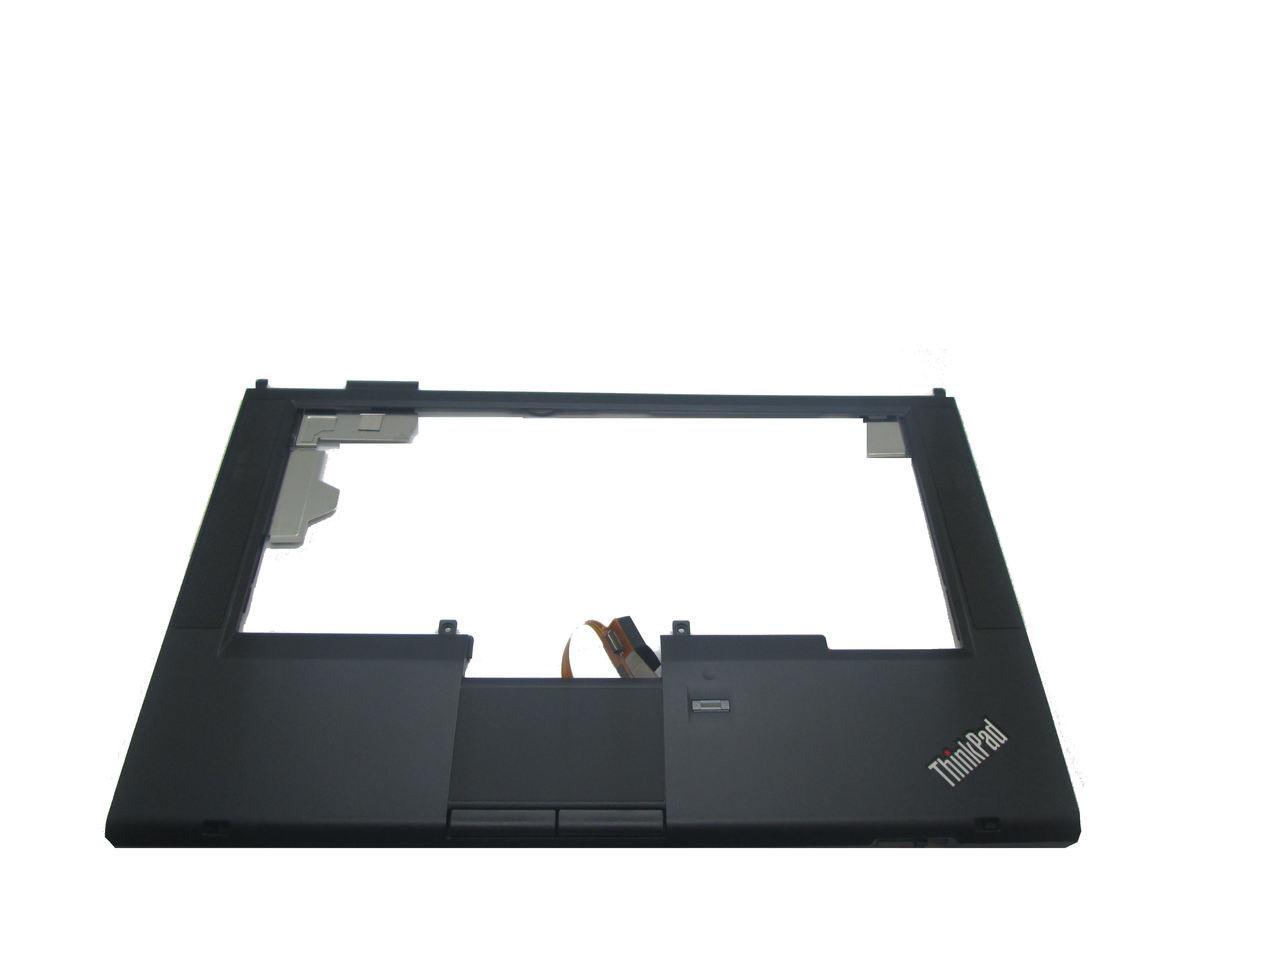 New Genuine Lenovo ThinkPad T430 Palmrest Touchpad 0B38940